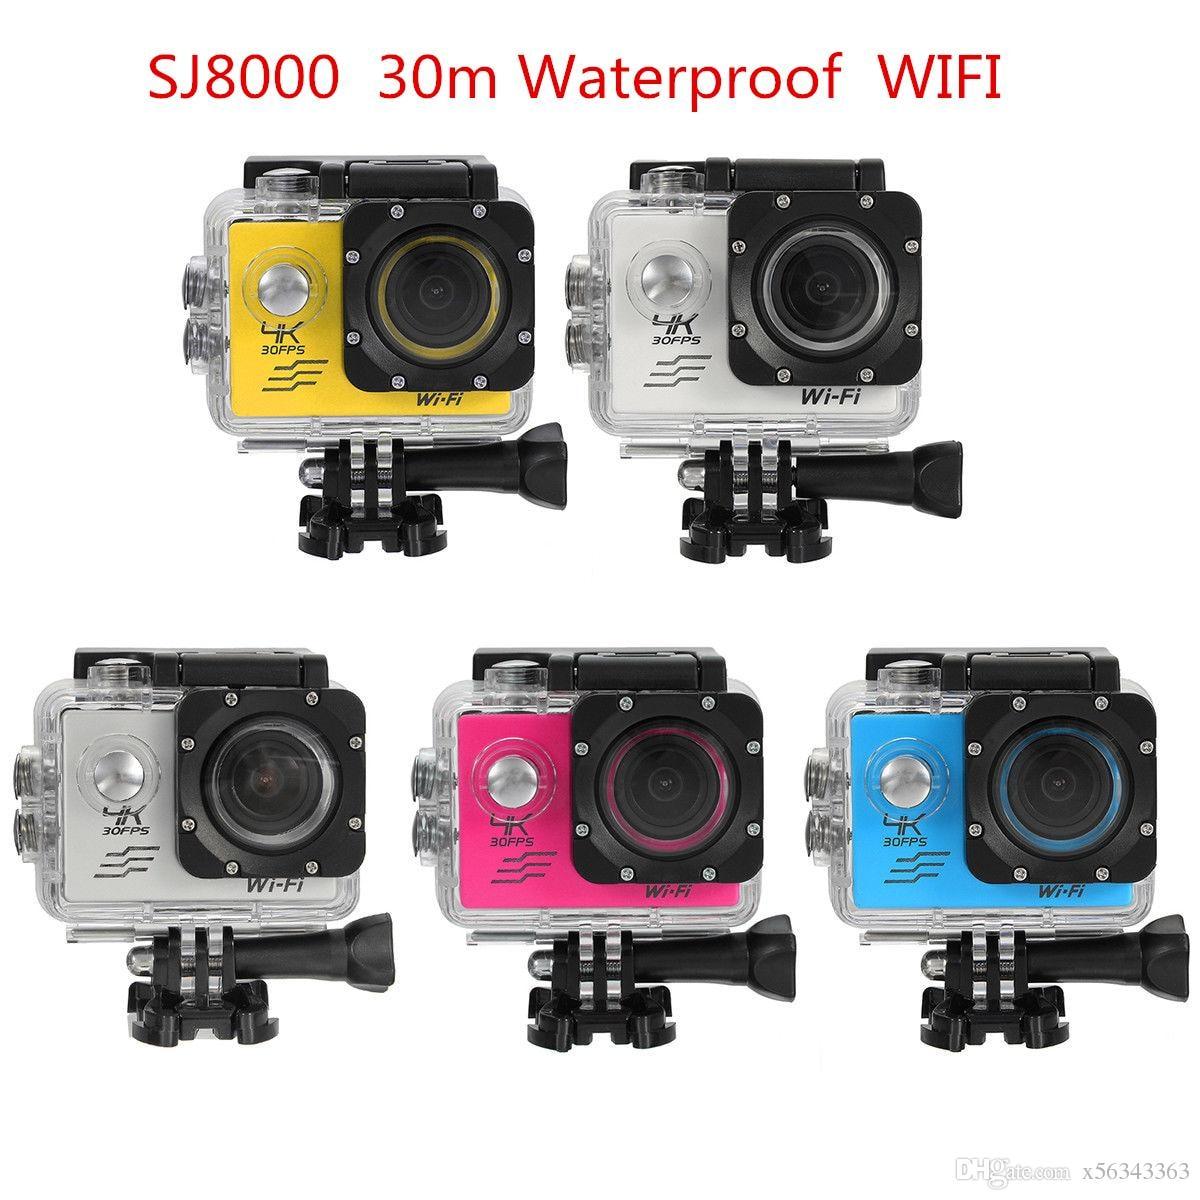 SJ8000 2.0 Inch Sport Action Camera - HD 4K 1080P, Wifi, DV 170 Degree Wide Angle Lens, 30M Waterproof, Remote Blue - 1